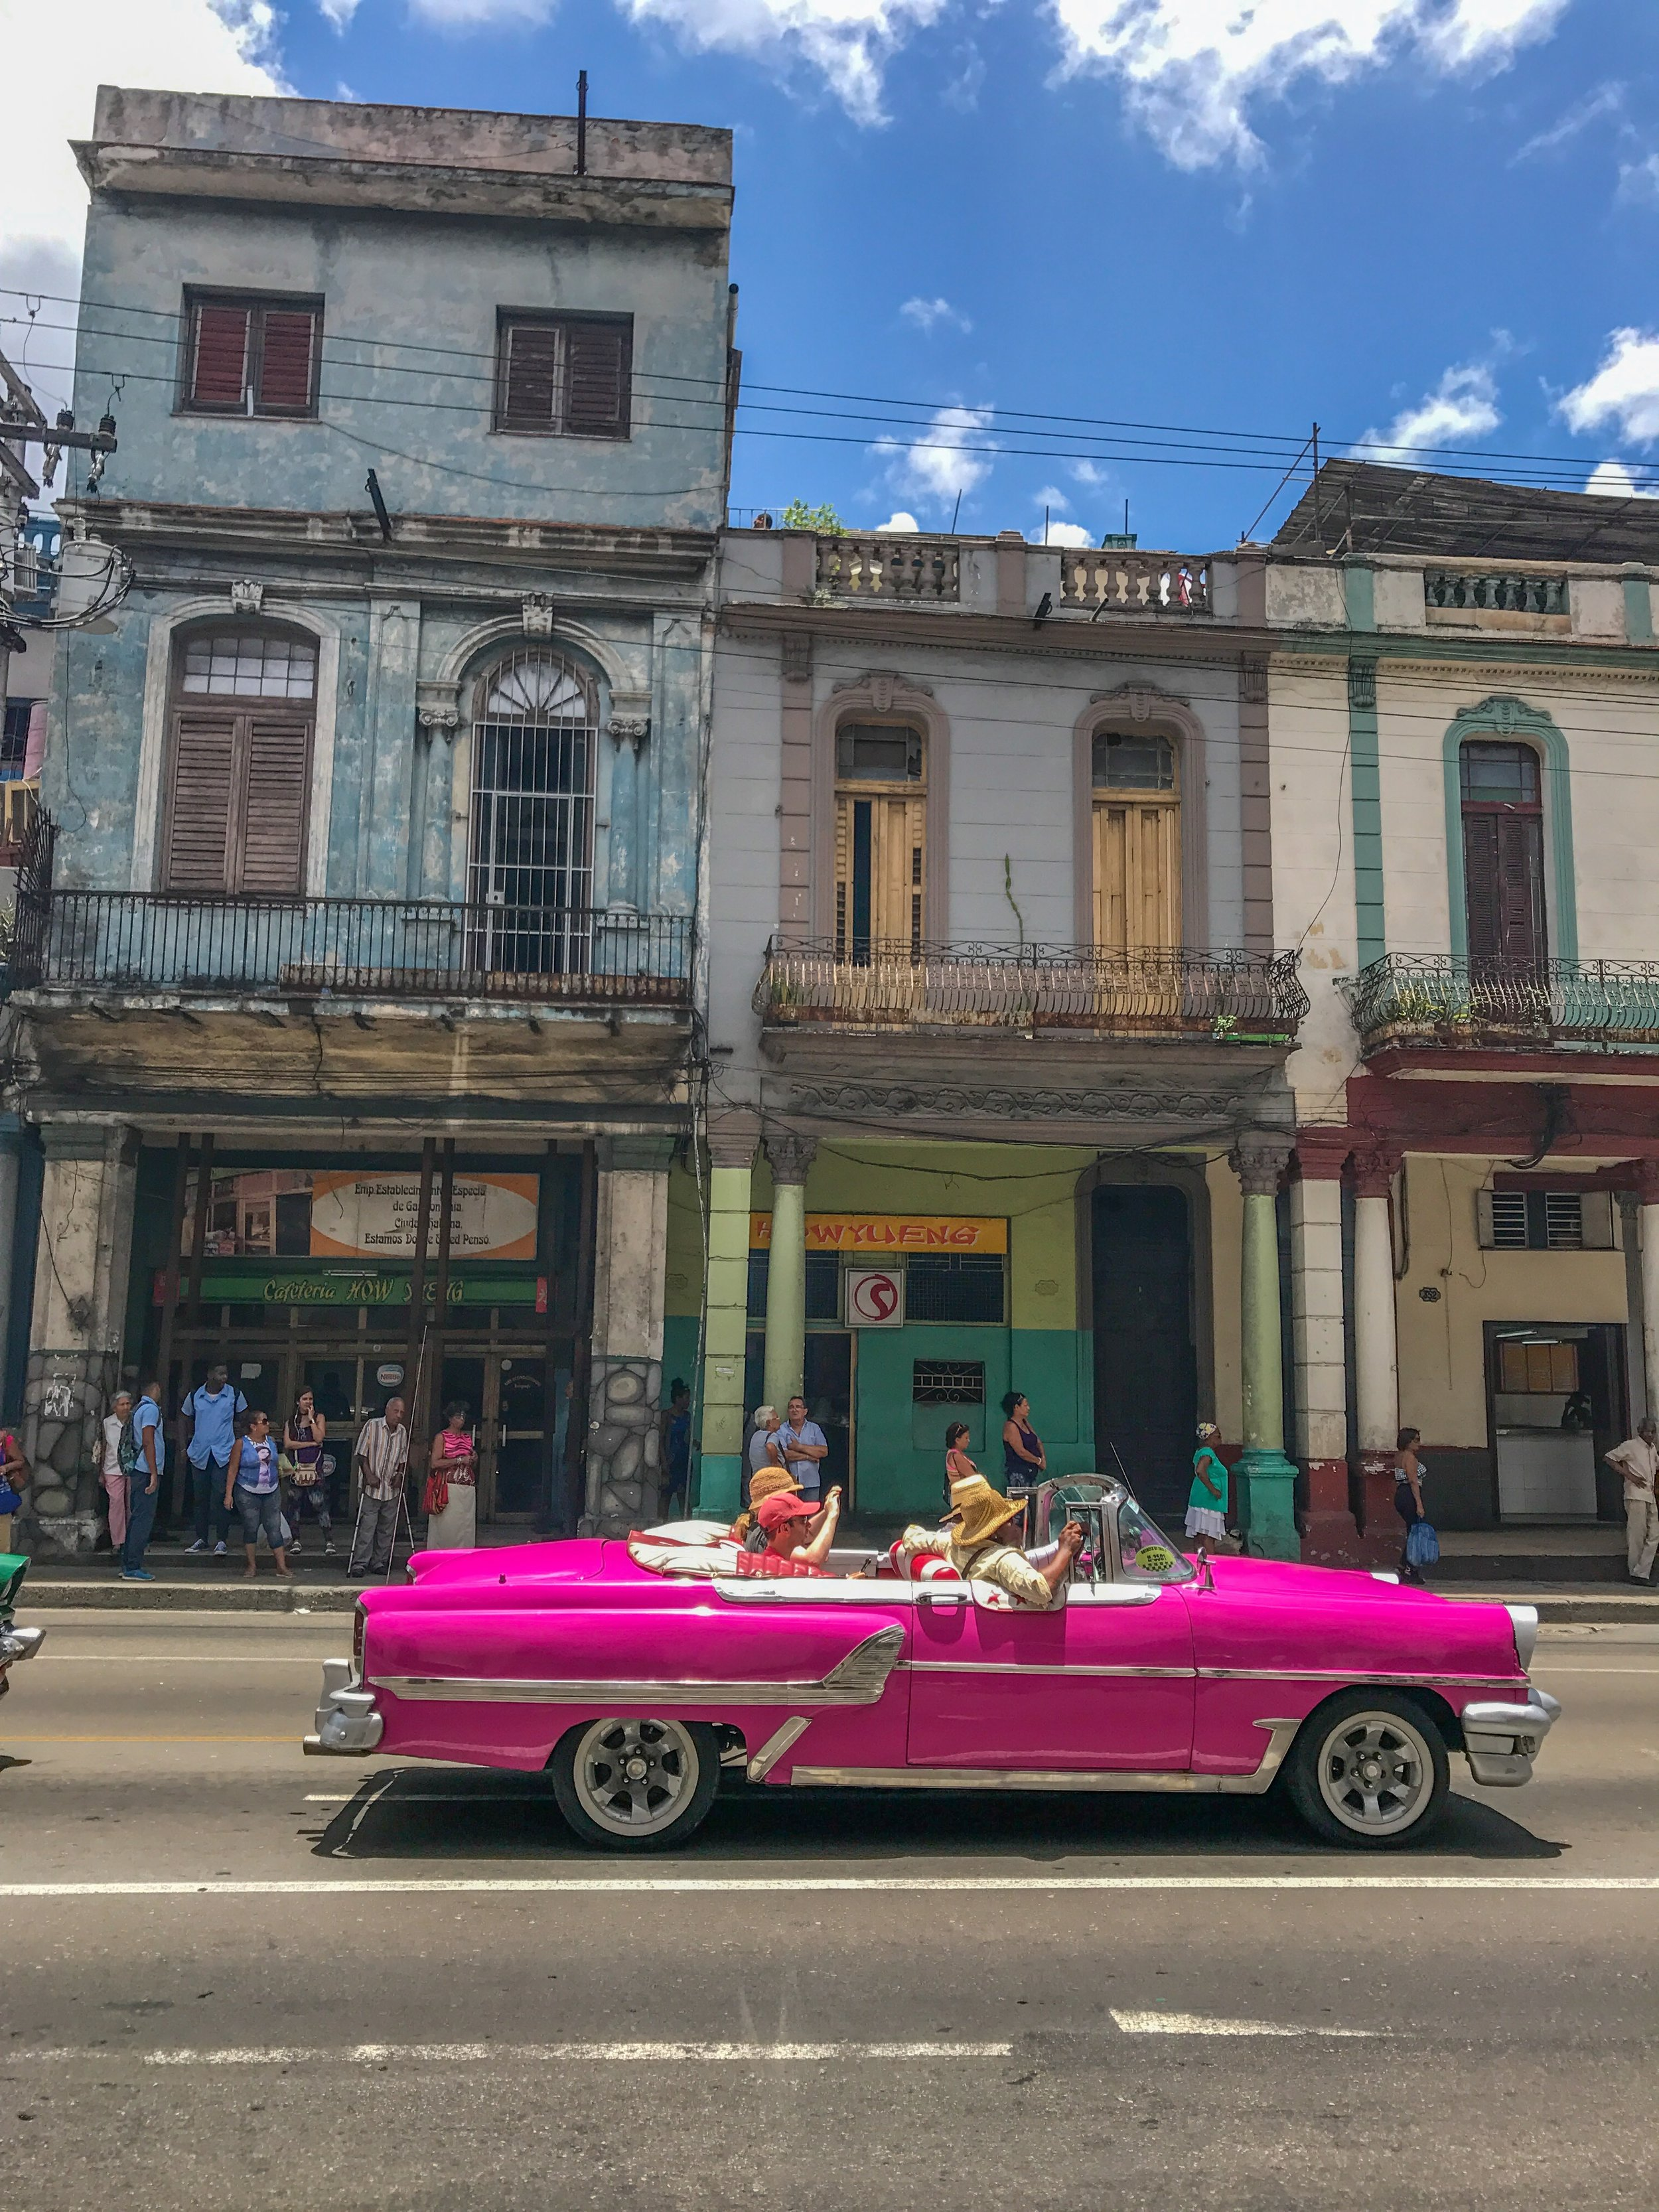 A Cuban classic car in Central Havana